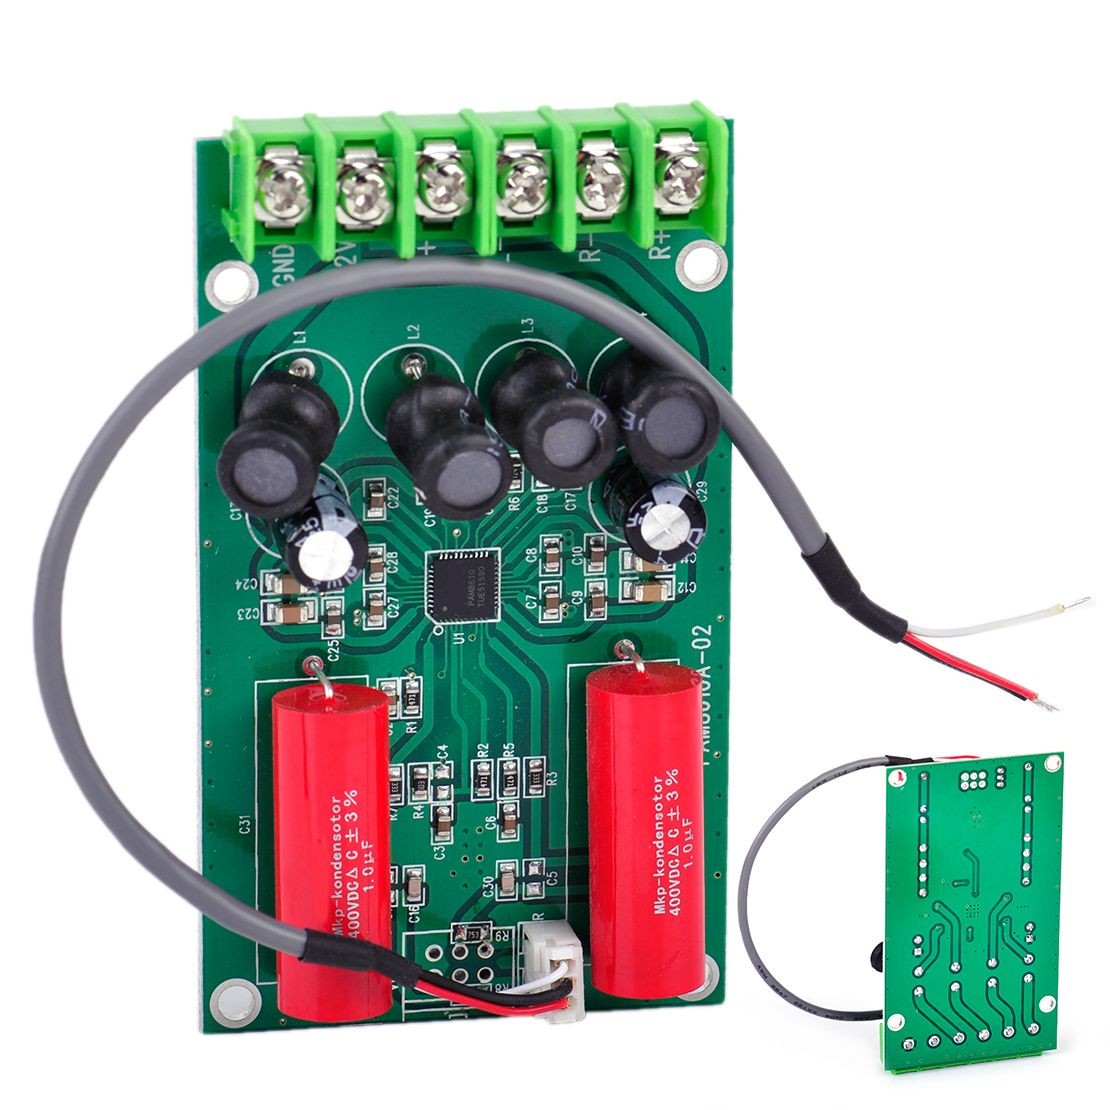 DWCX 12V Car TA2024 Mini Digital Audio AMP Amplifier Board